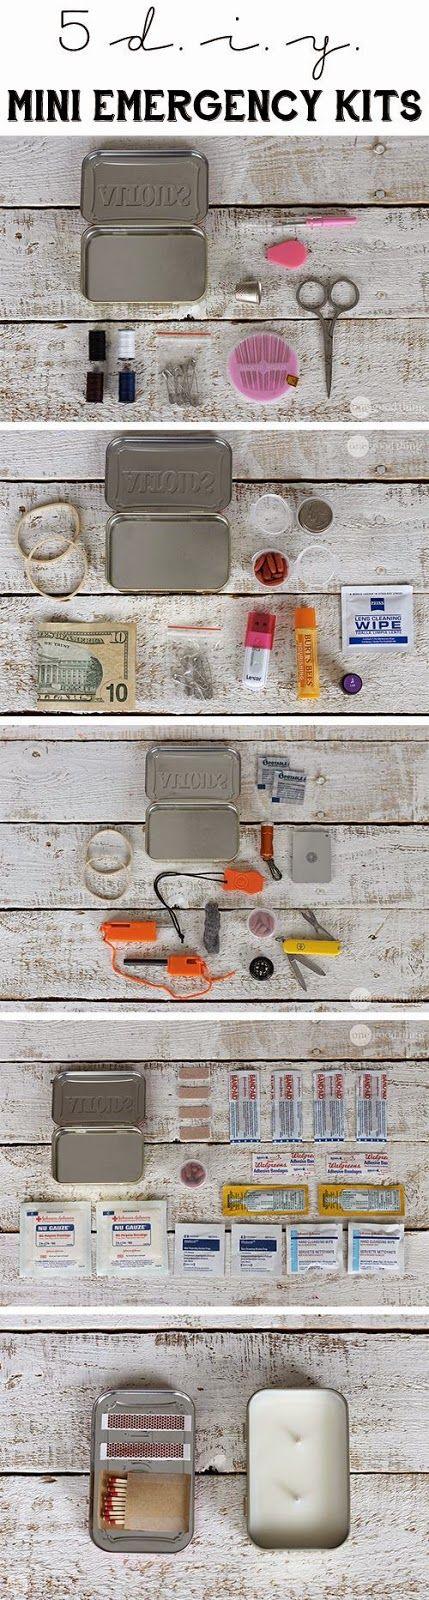 Craft Project Ideas: 5 DIY MINI EMERGENCY KITS